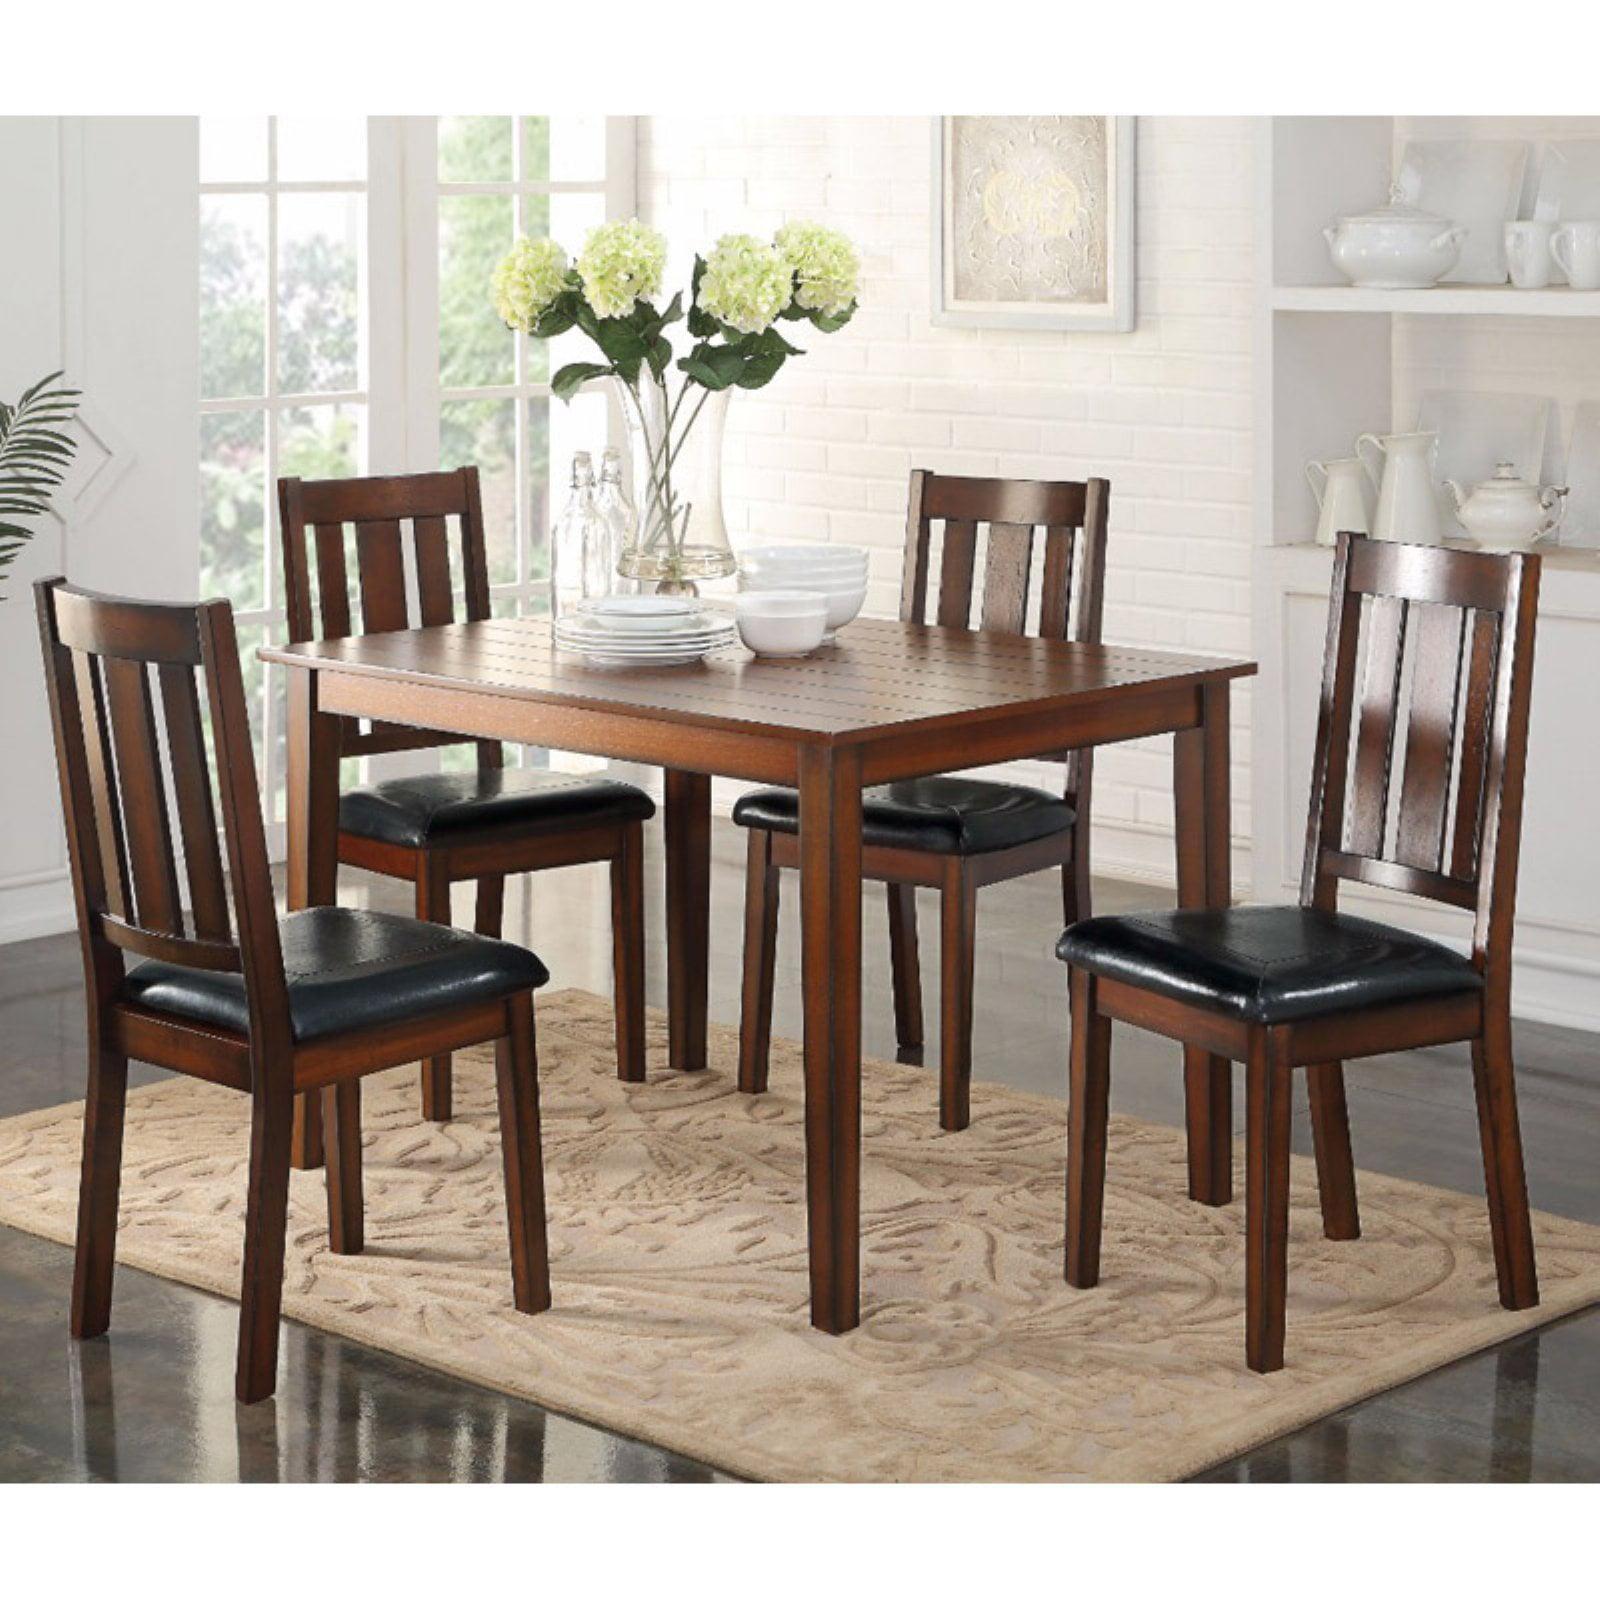 Stylish Wooden Dining Set, Black & Brown, 5 Piece set